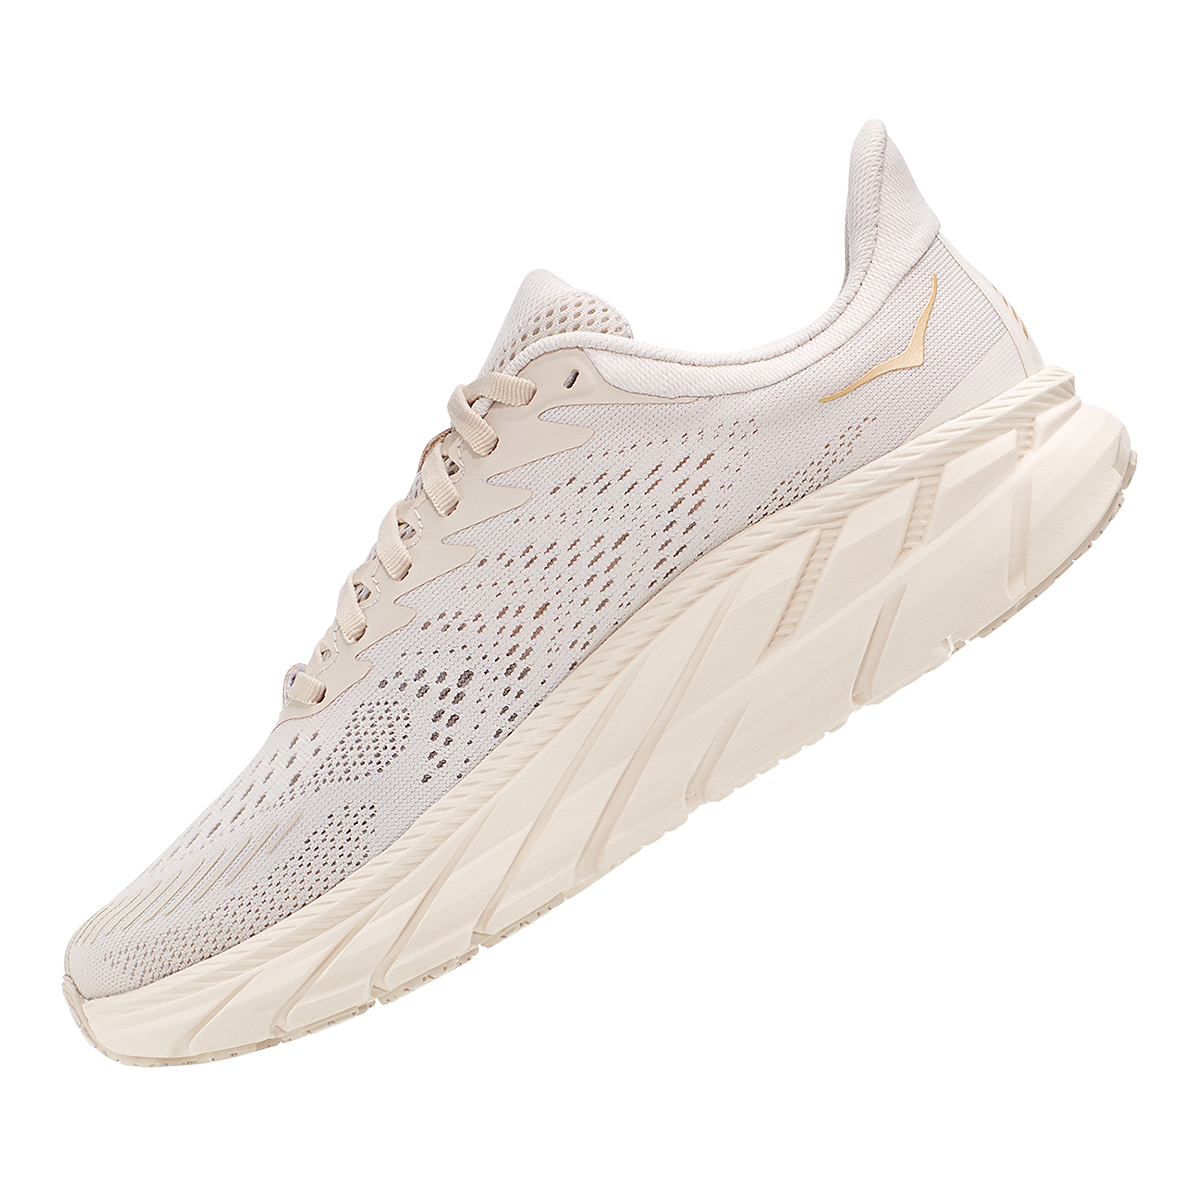 Women's Hoka One One Clifton 7 Running Shoe - Color: Almond Milk/Bronze - Size: 5 - Width: Regular, Almond Milk/Bronze, large, image 4